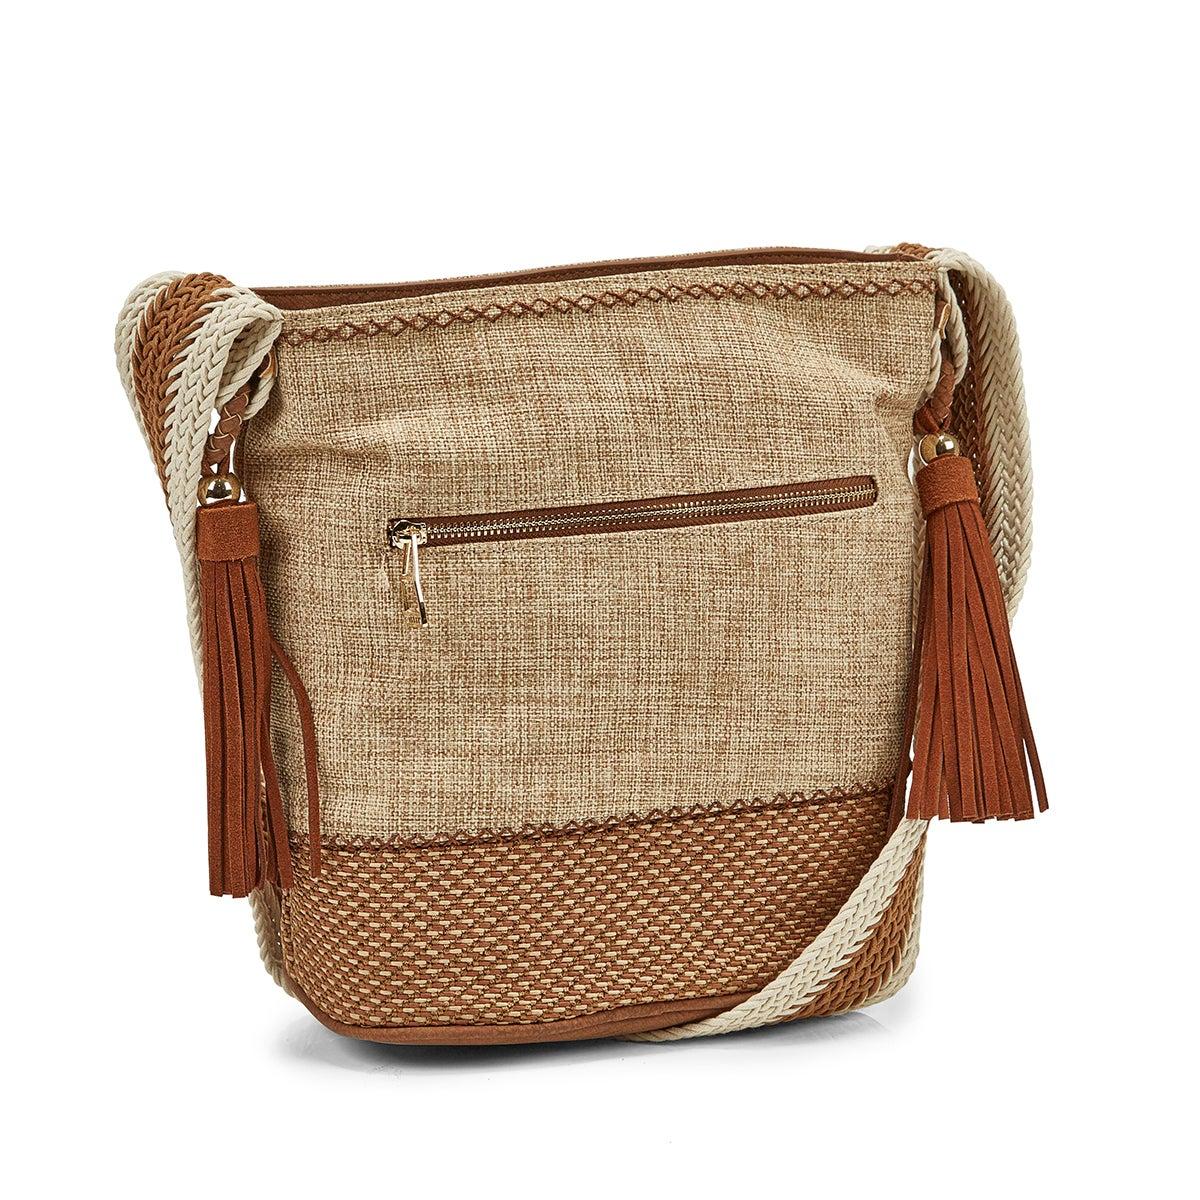 Women's JHUNTER natural tote bag